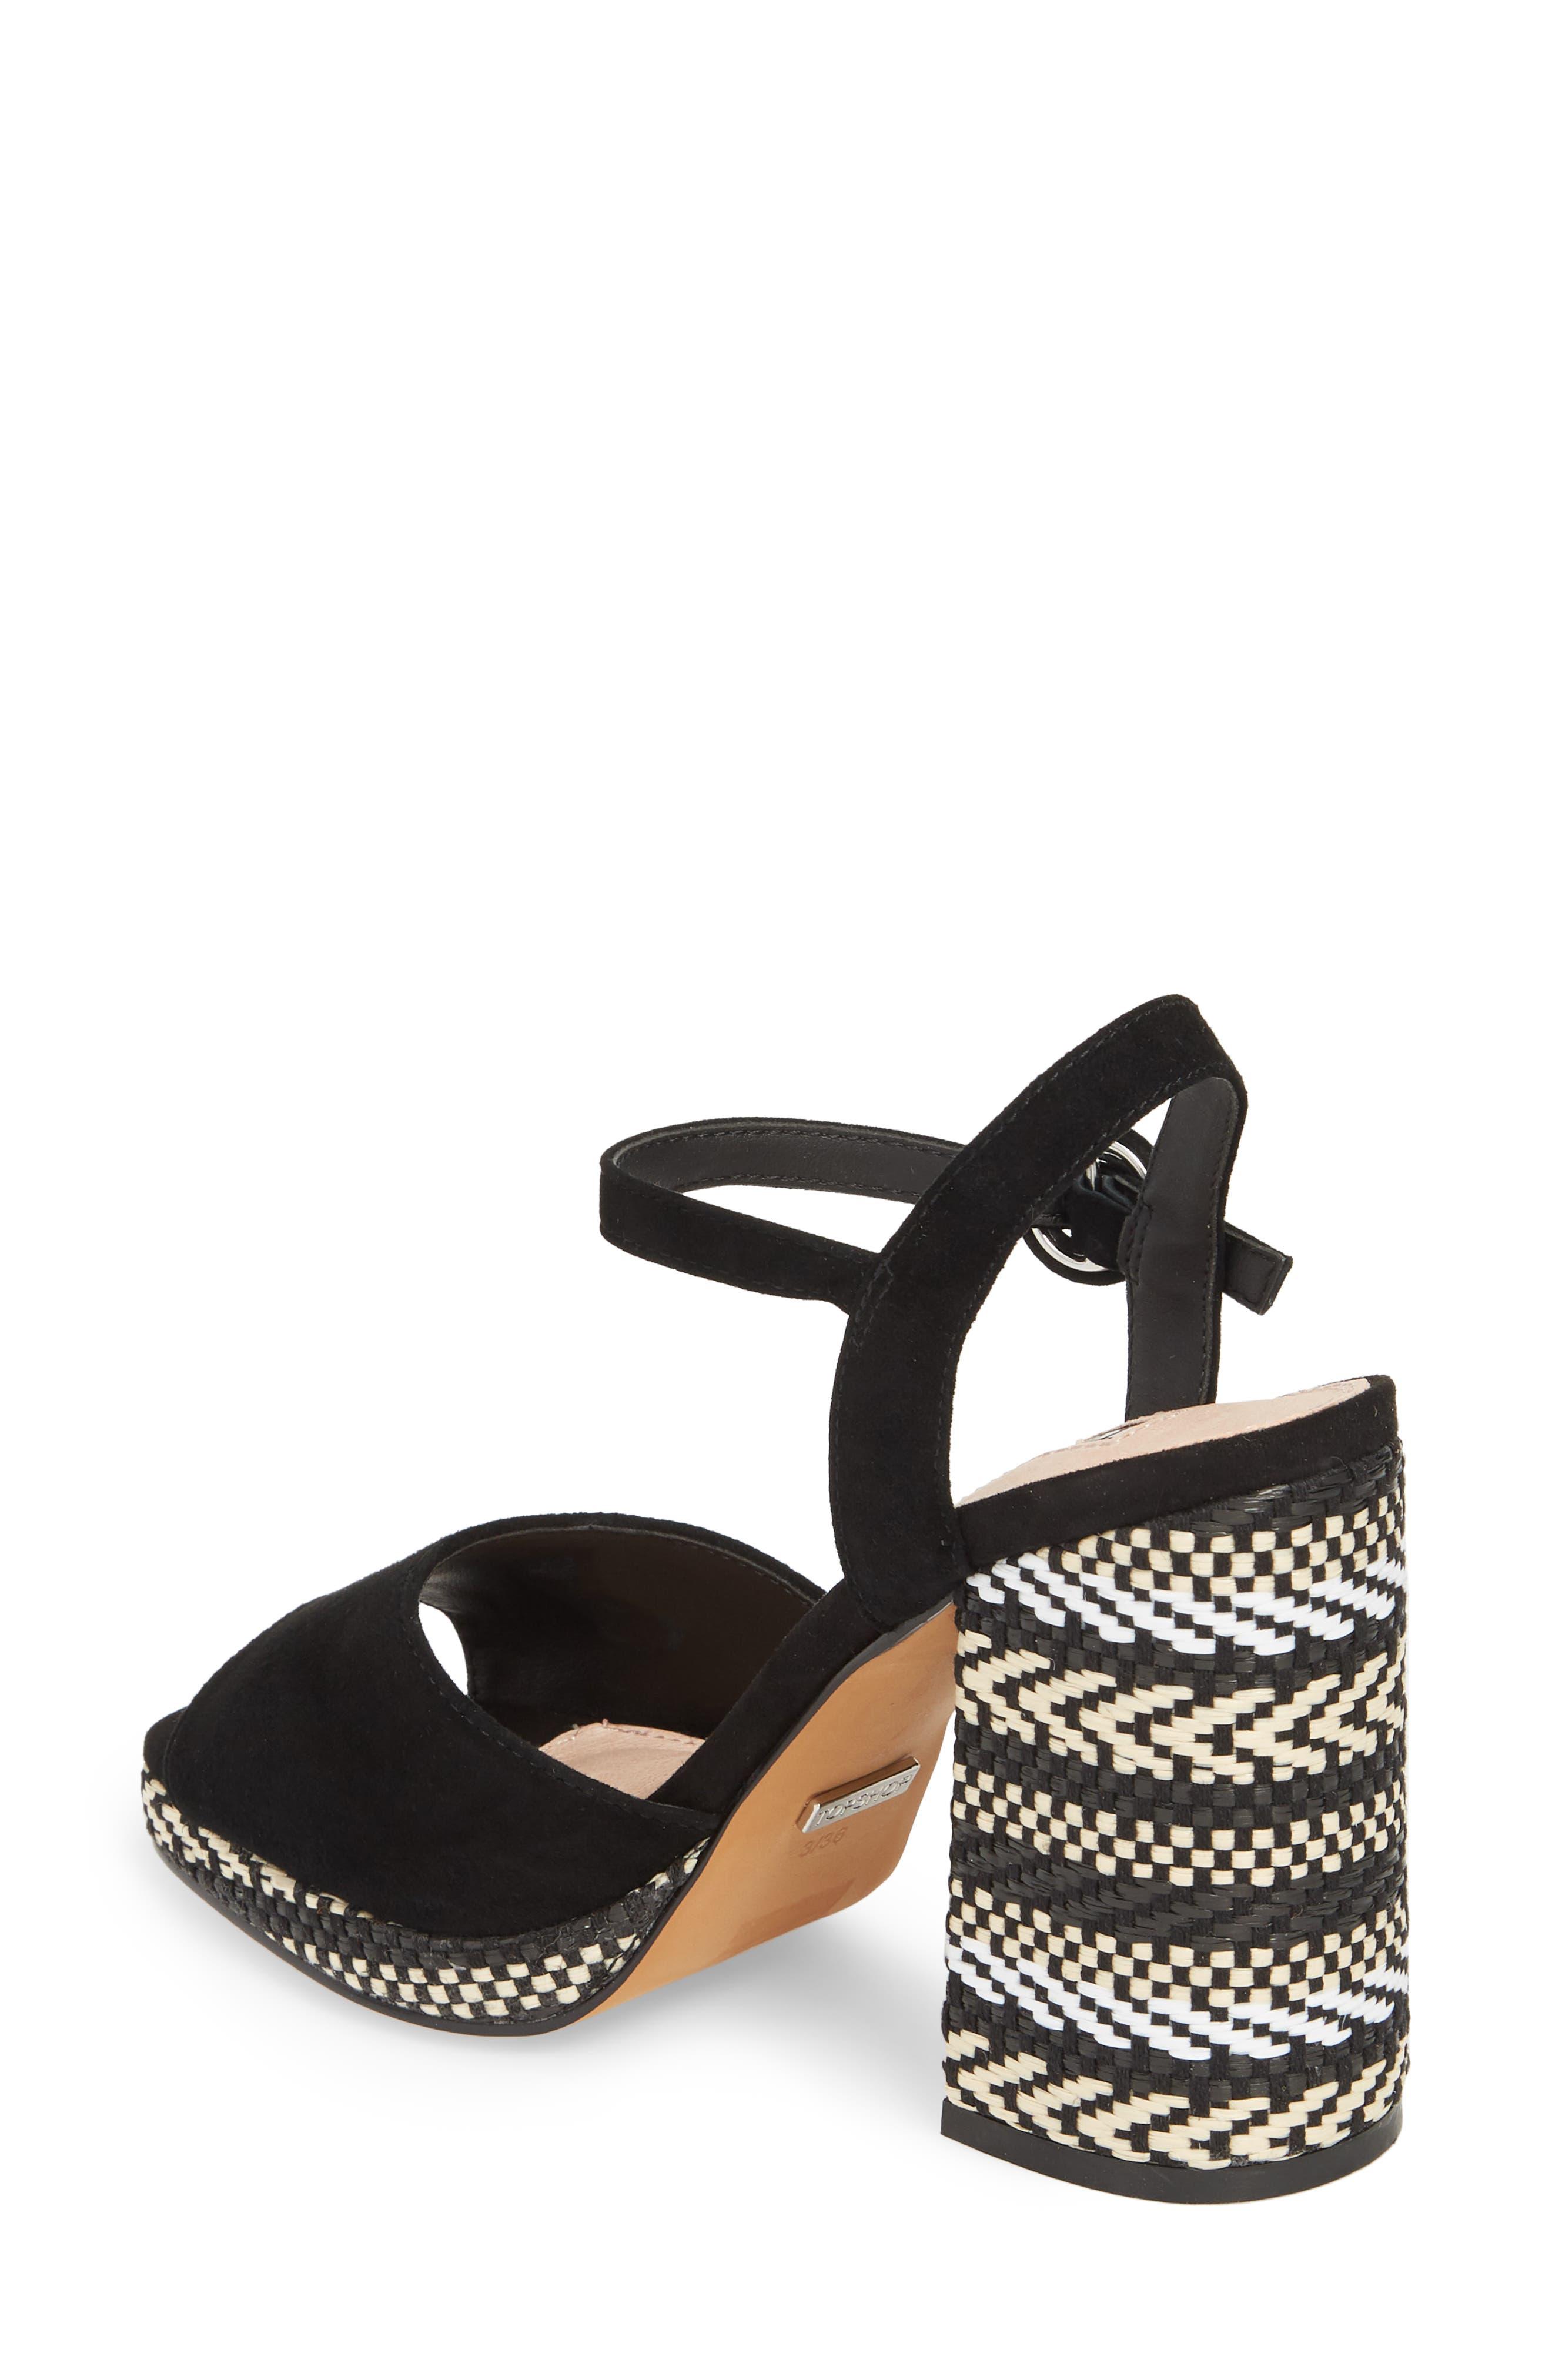 Laura Woven Block Heel Sandal,                             Alternate thumbnail 2, color,                             Black Multi